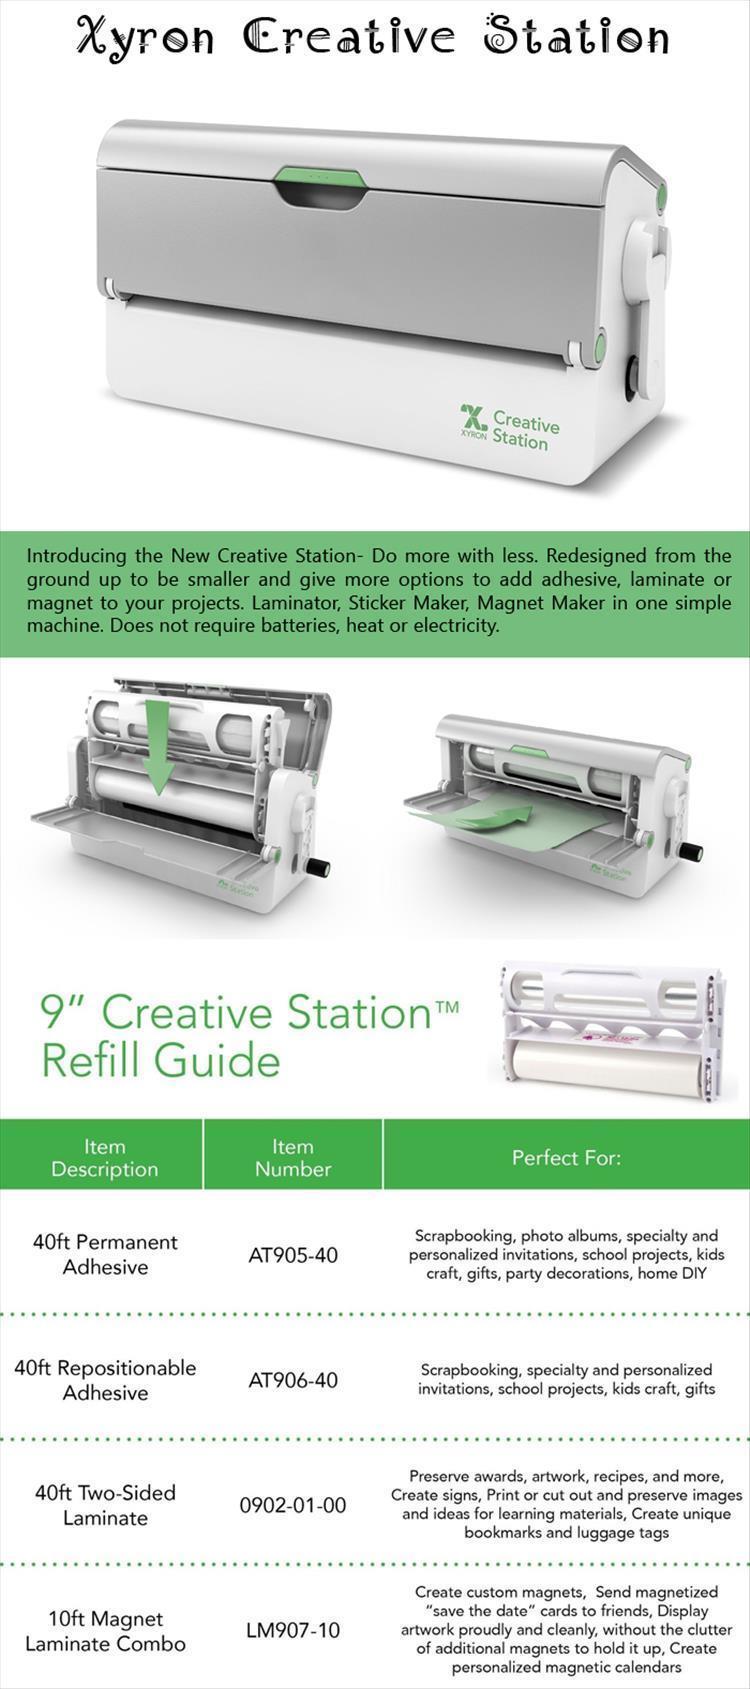 Xyron Creative Station